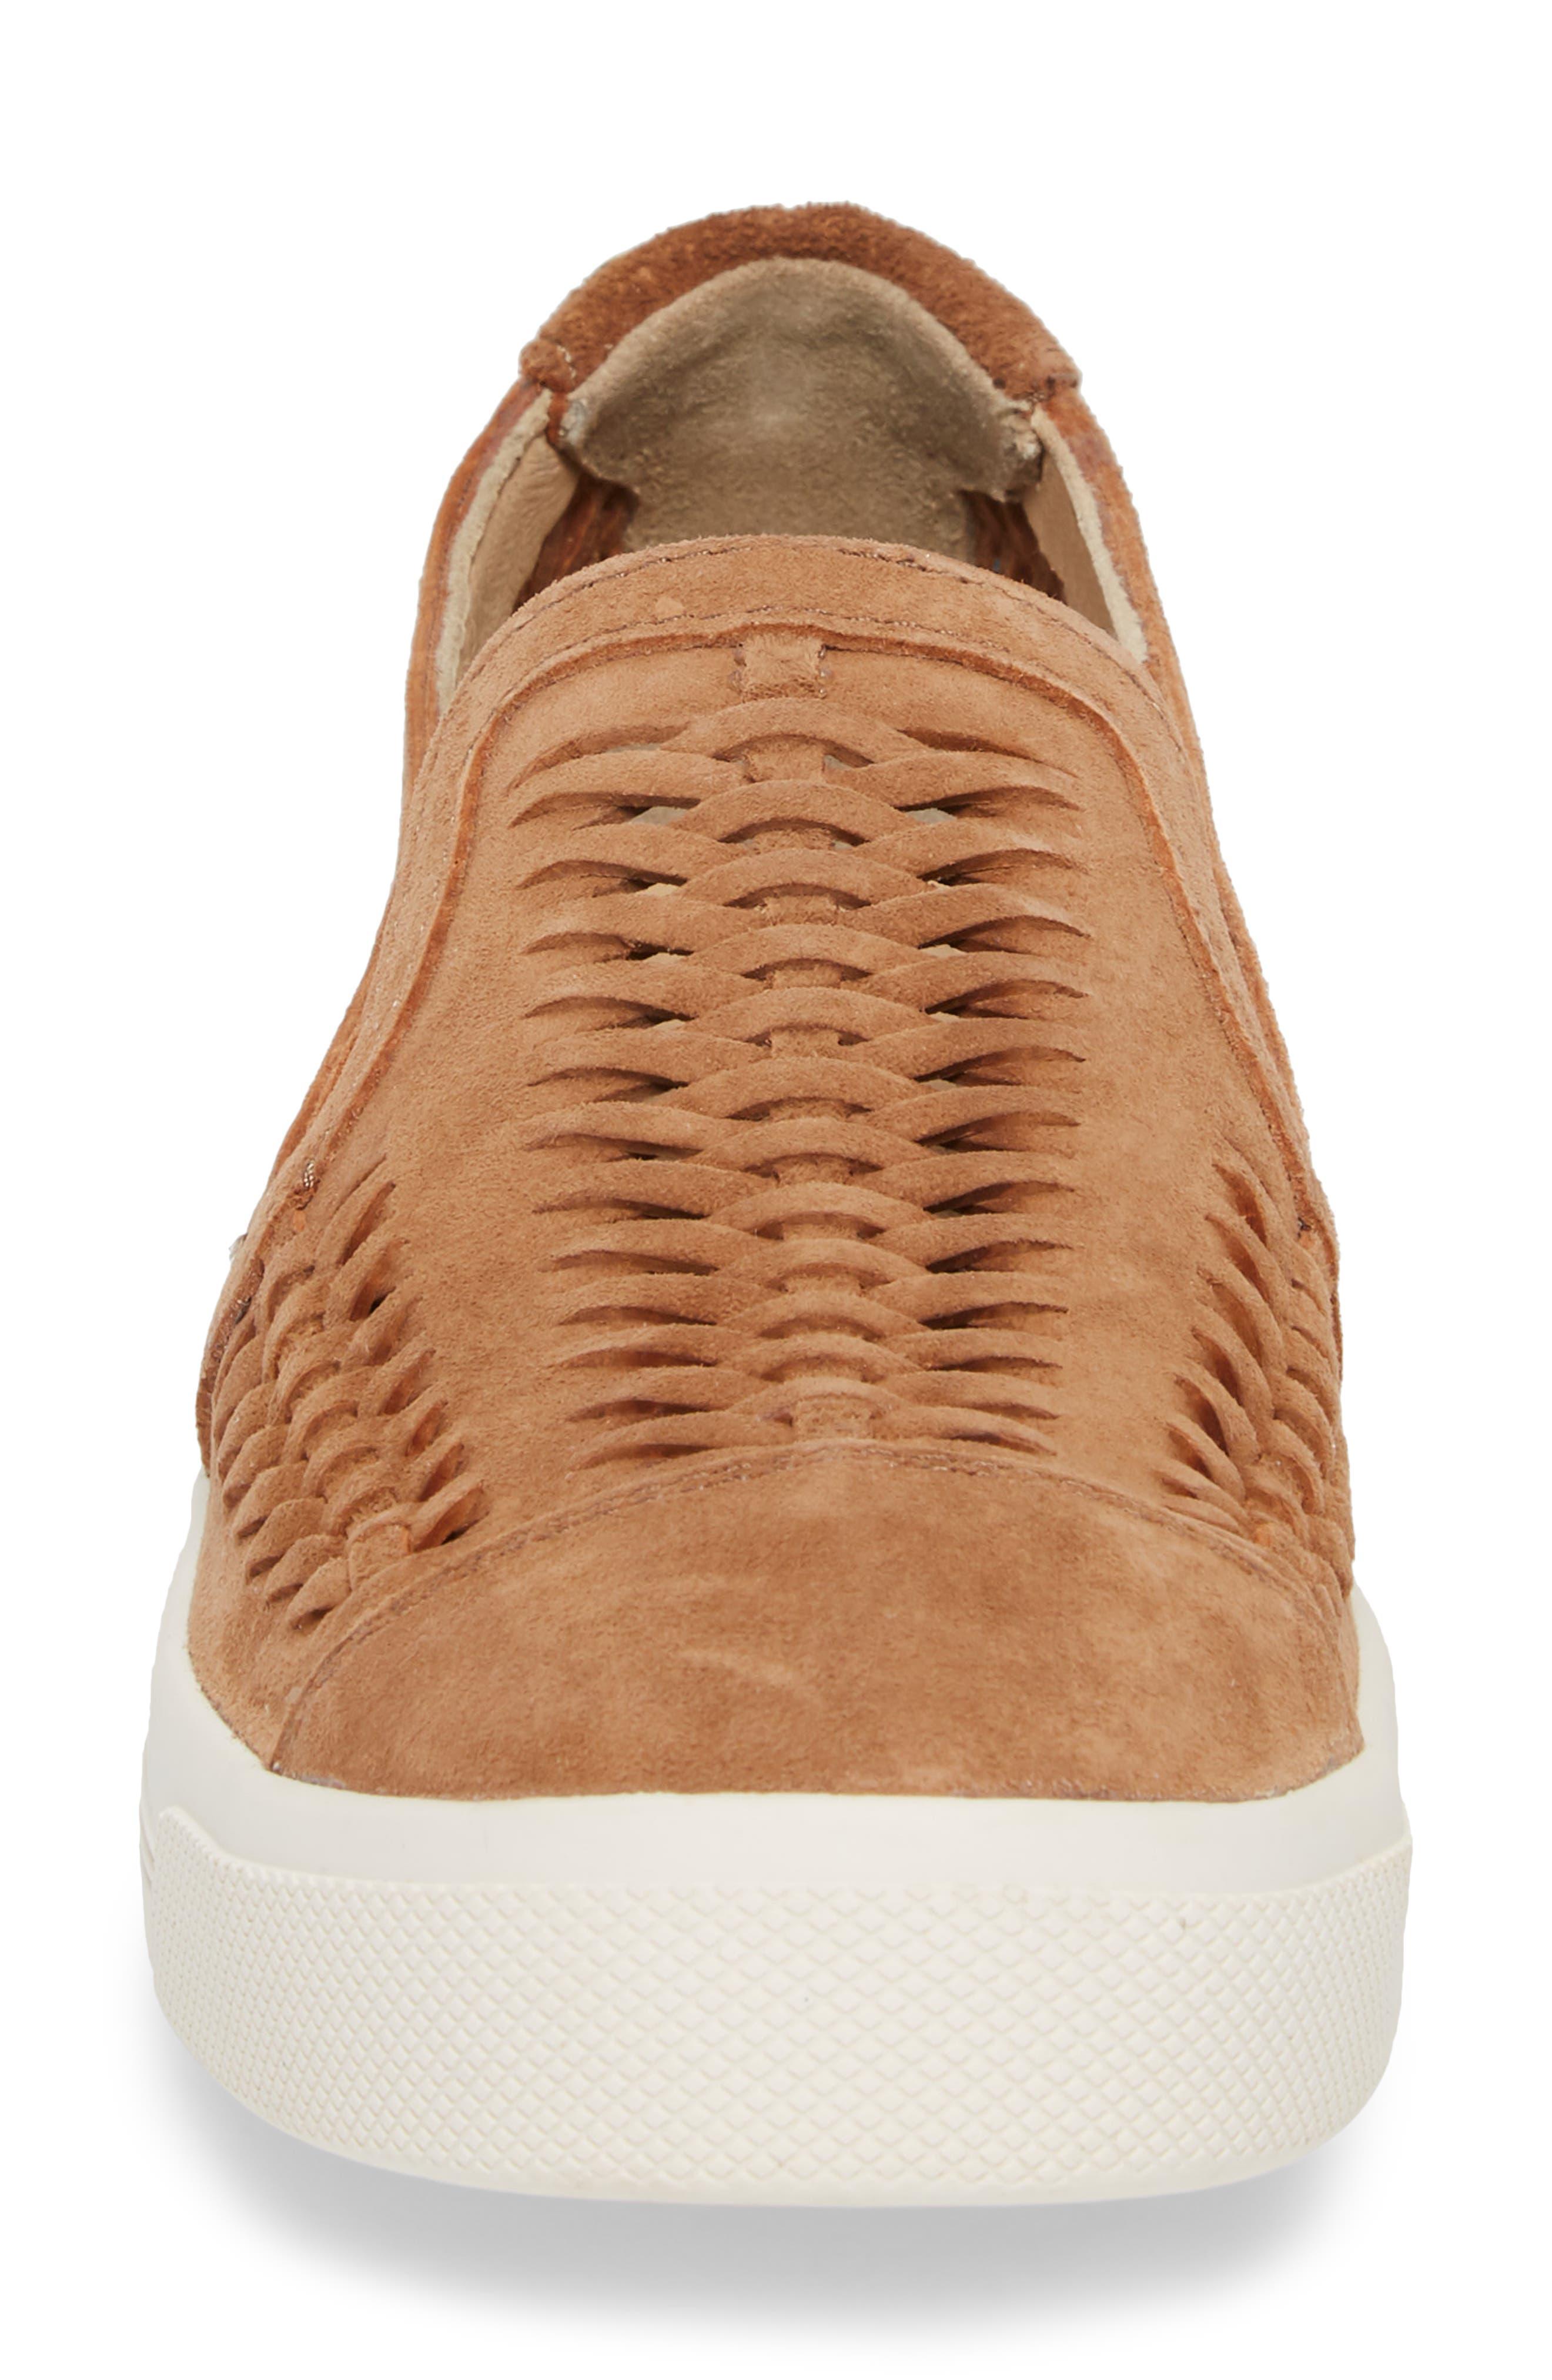 Gabbie Slip-On Sneaker,                             Alternate thumbnail 4, color,                             Tan Suede